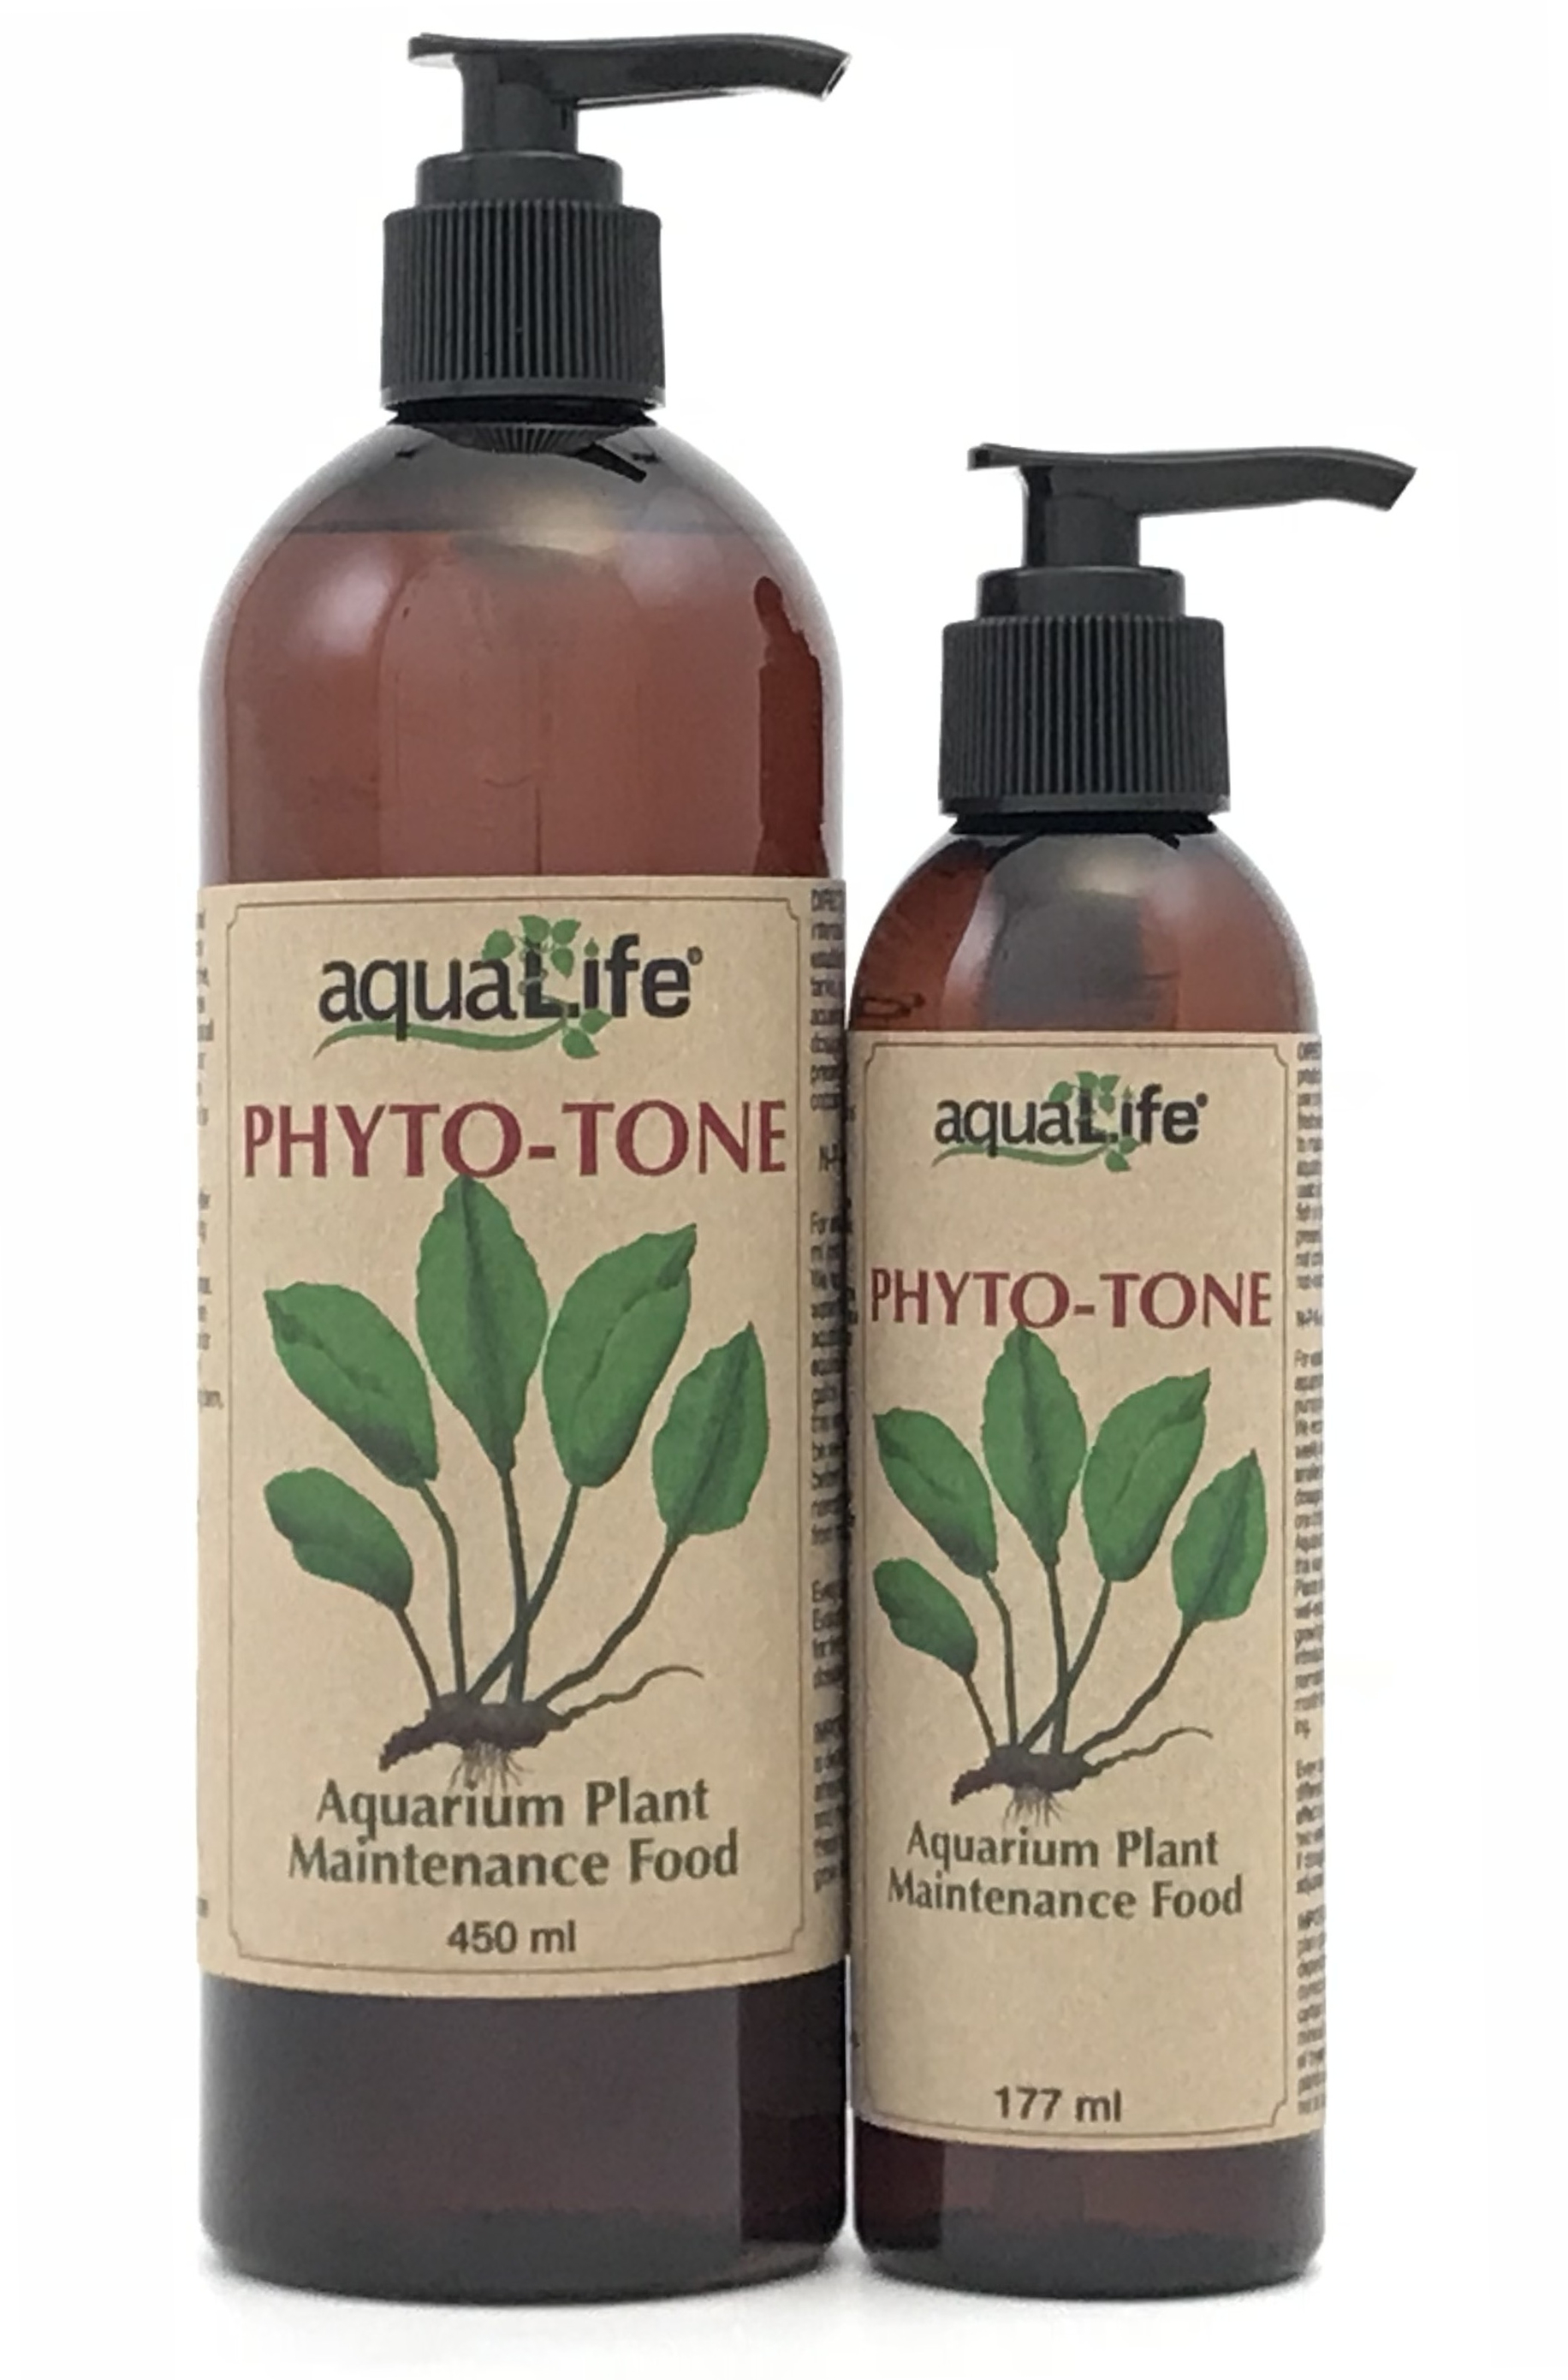 Phyto-Tone 450 ml